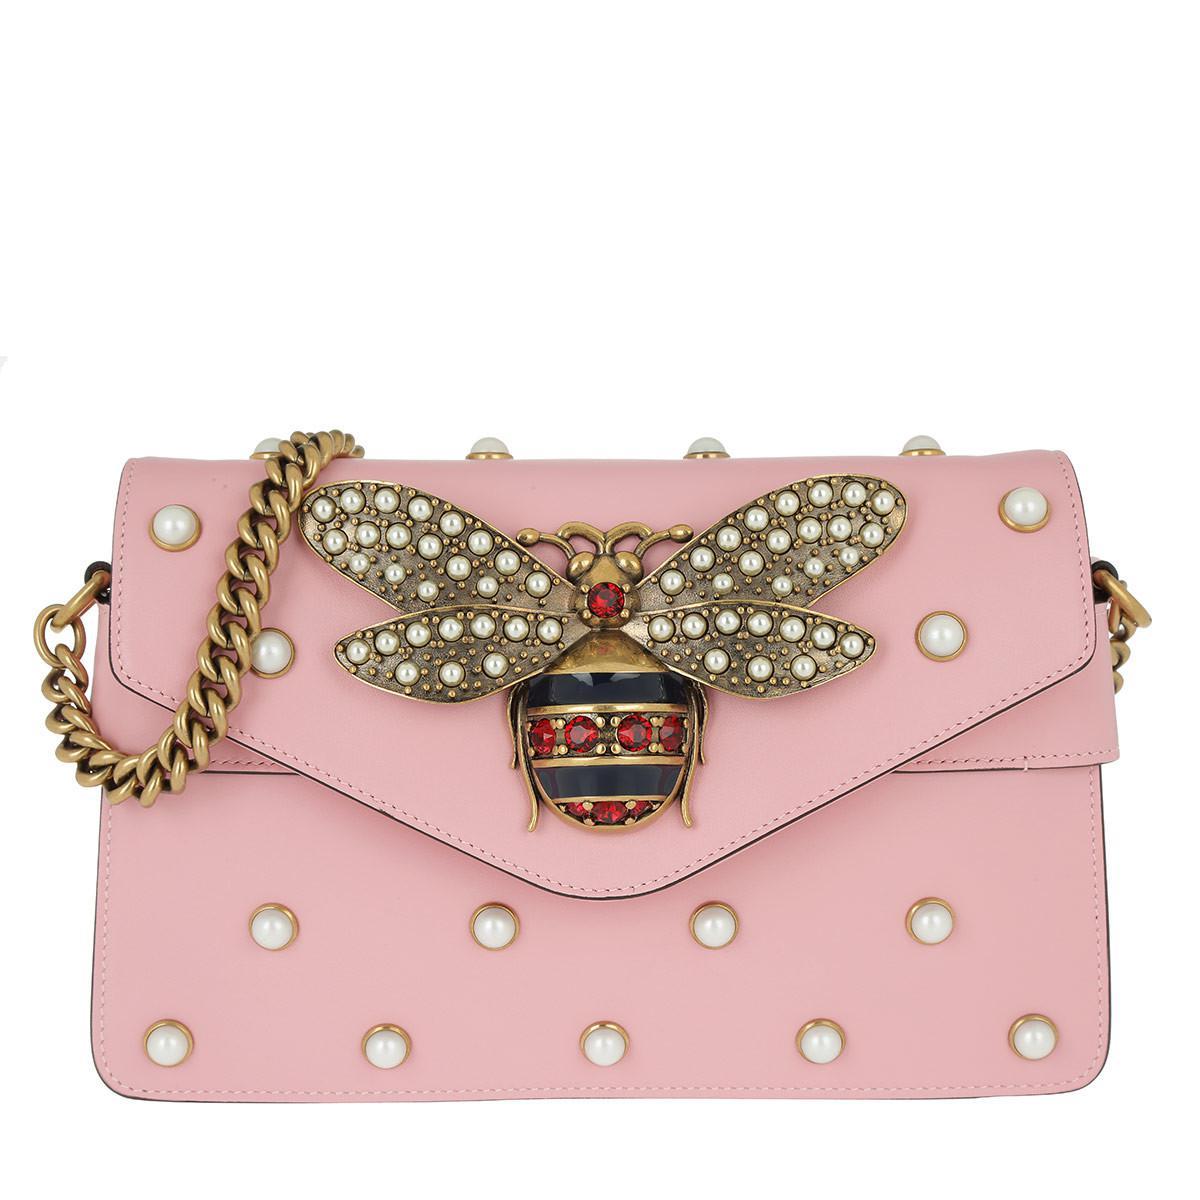 Broadway leather mini bag - Pink & Purple Gucci cLb3E2FL4